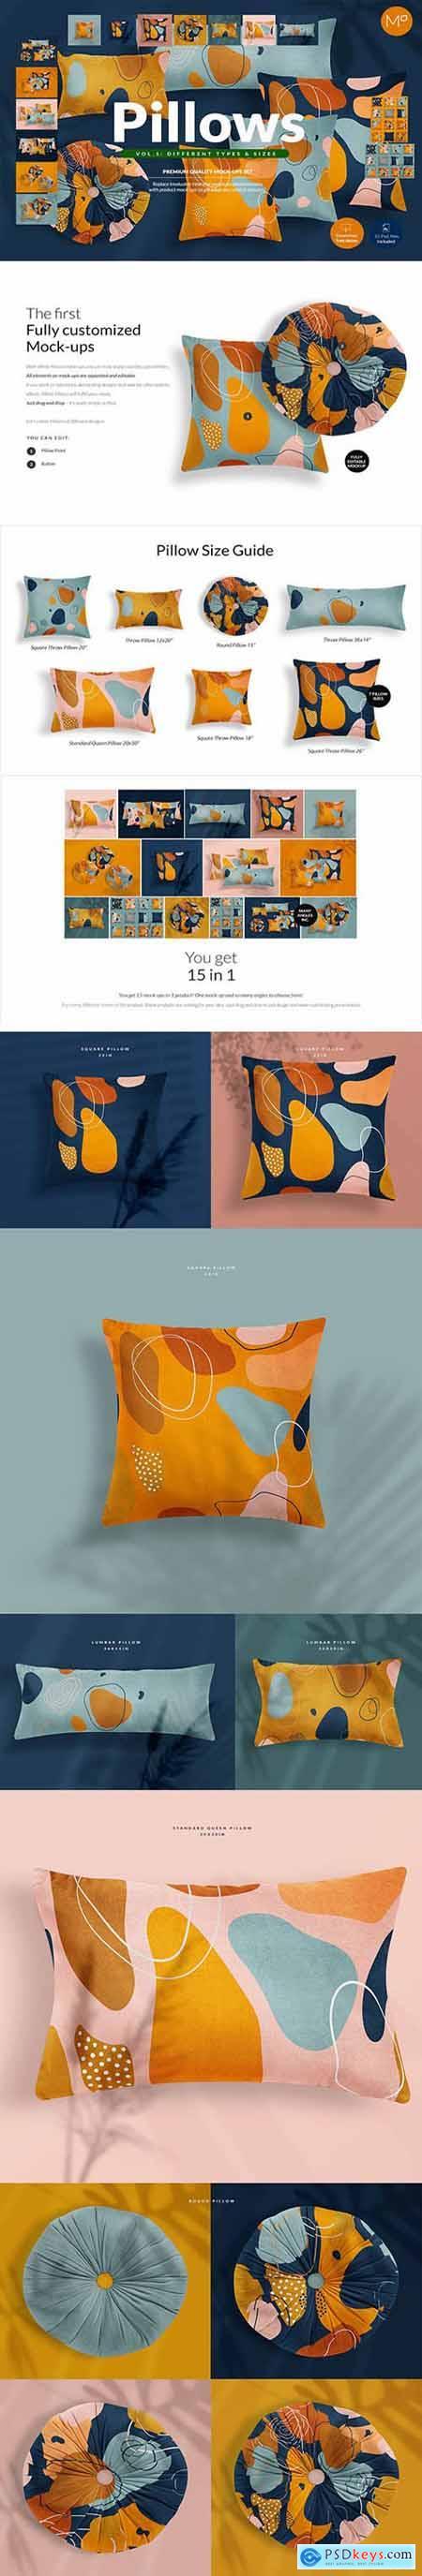 Pillows vol.1- Types & Sizes Mockups 5236271